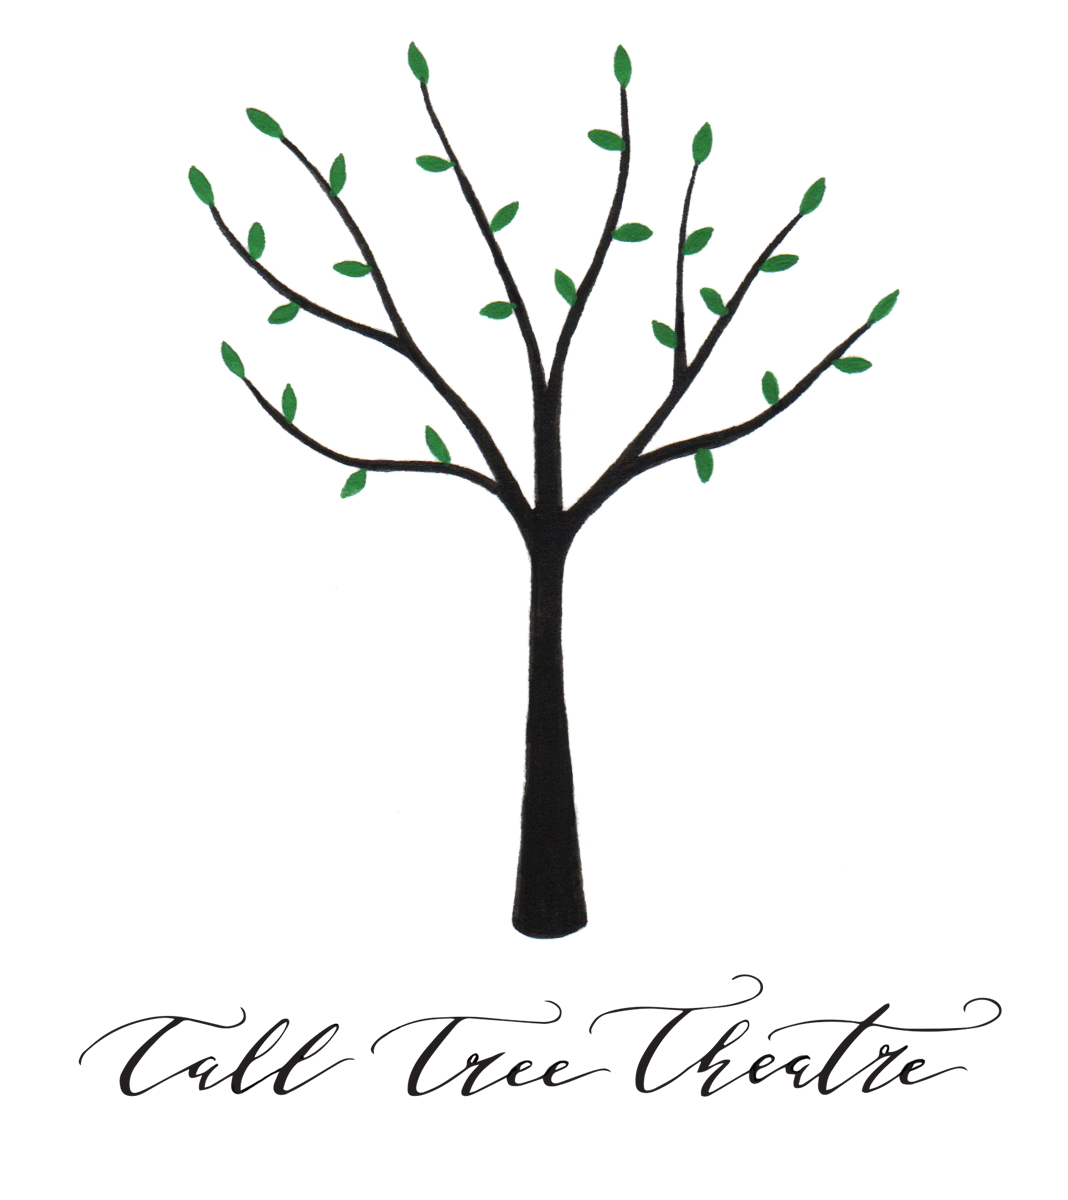 View member Tall Tree Theatre